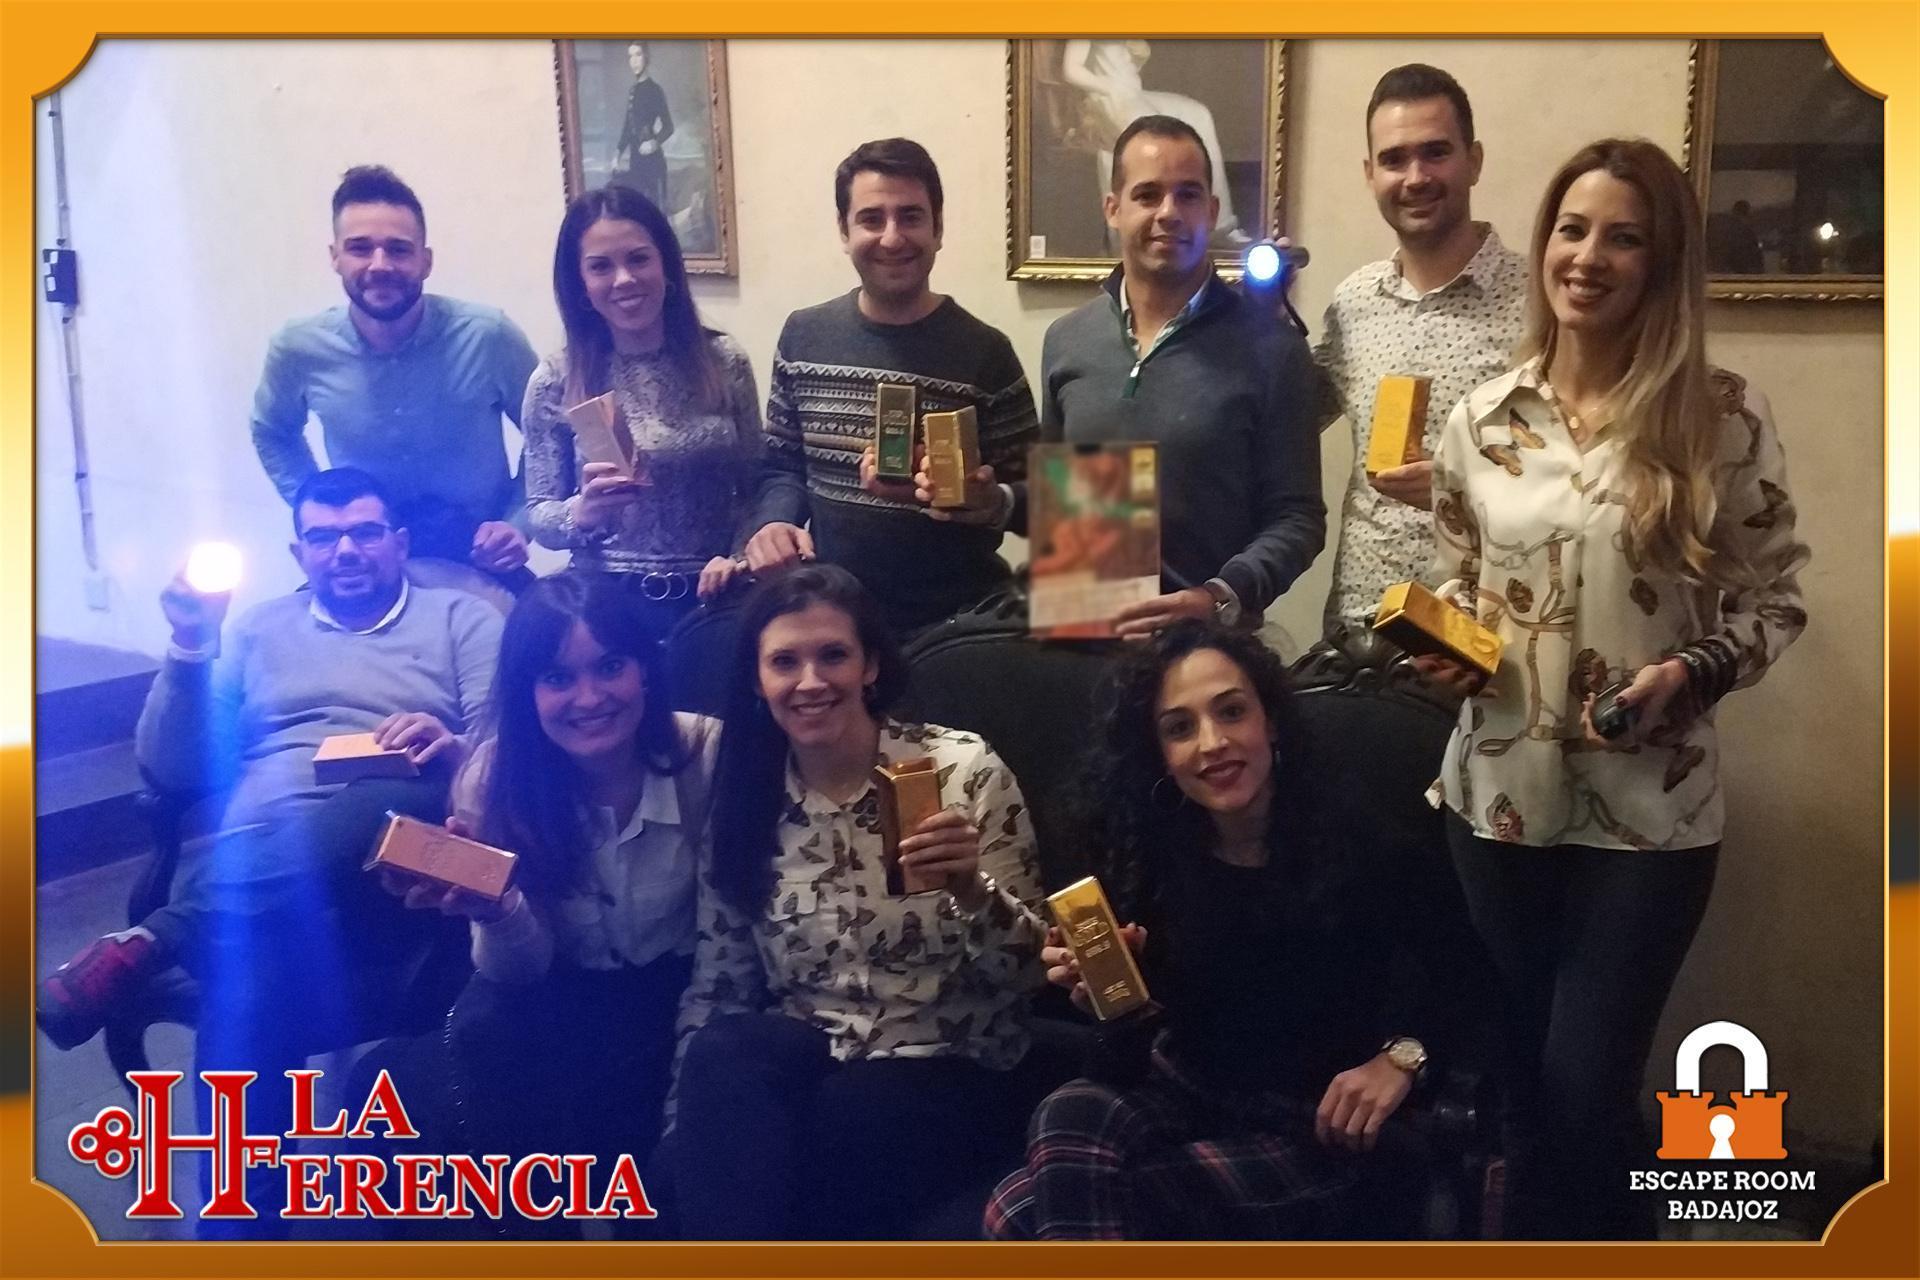 Equipo-paraguayos-escape-room-badajoz